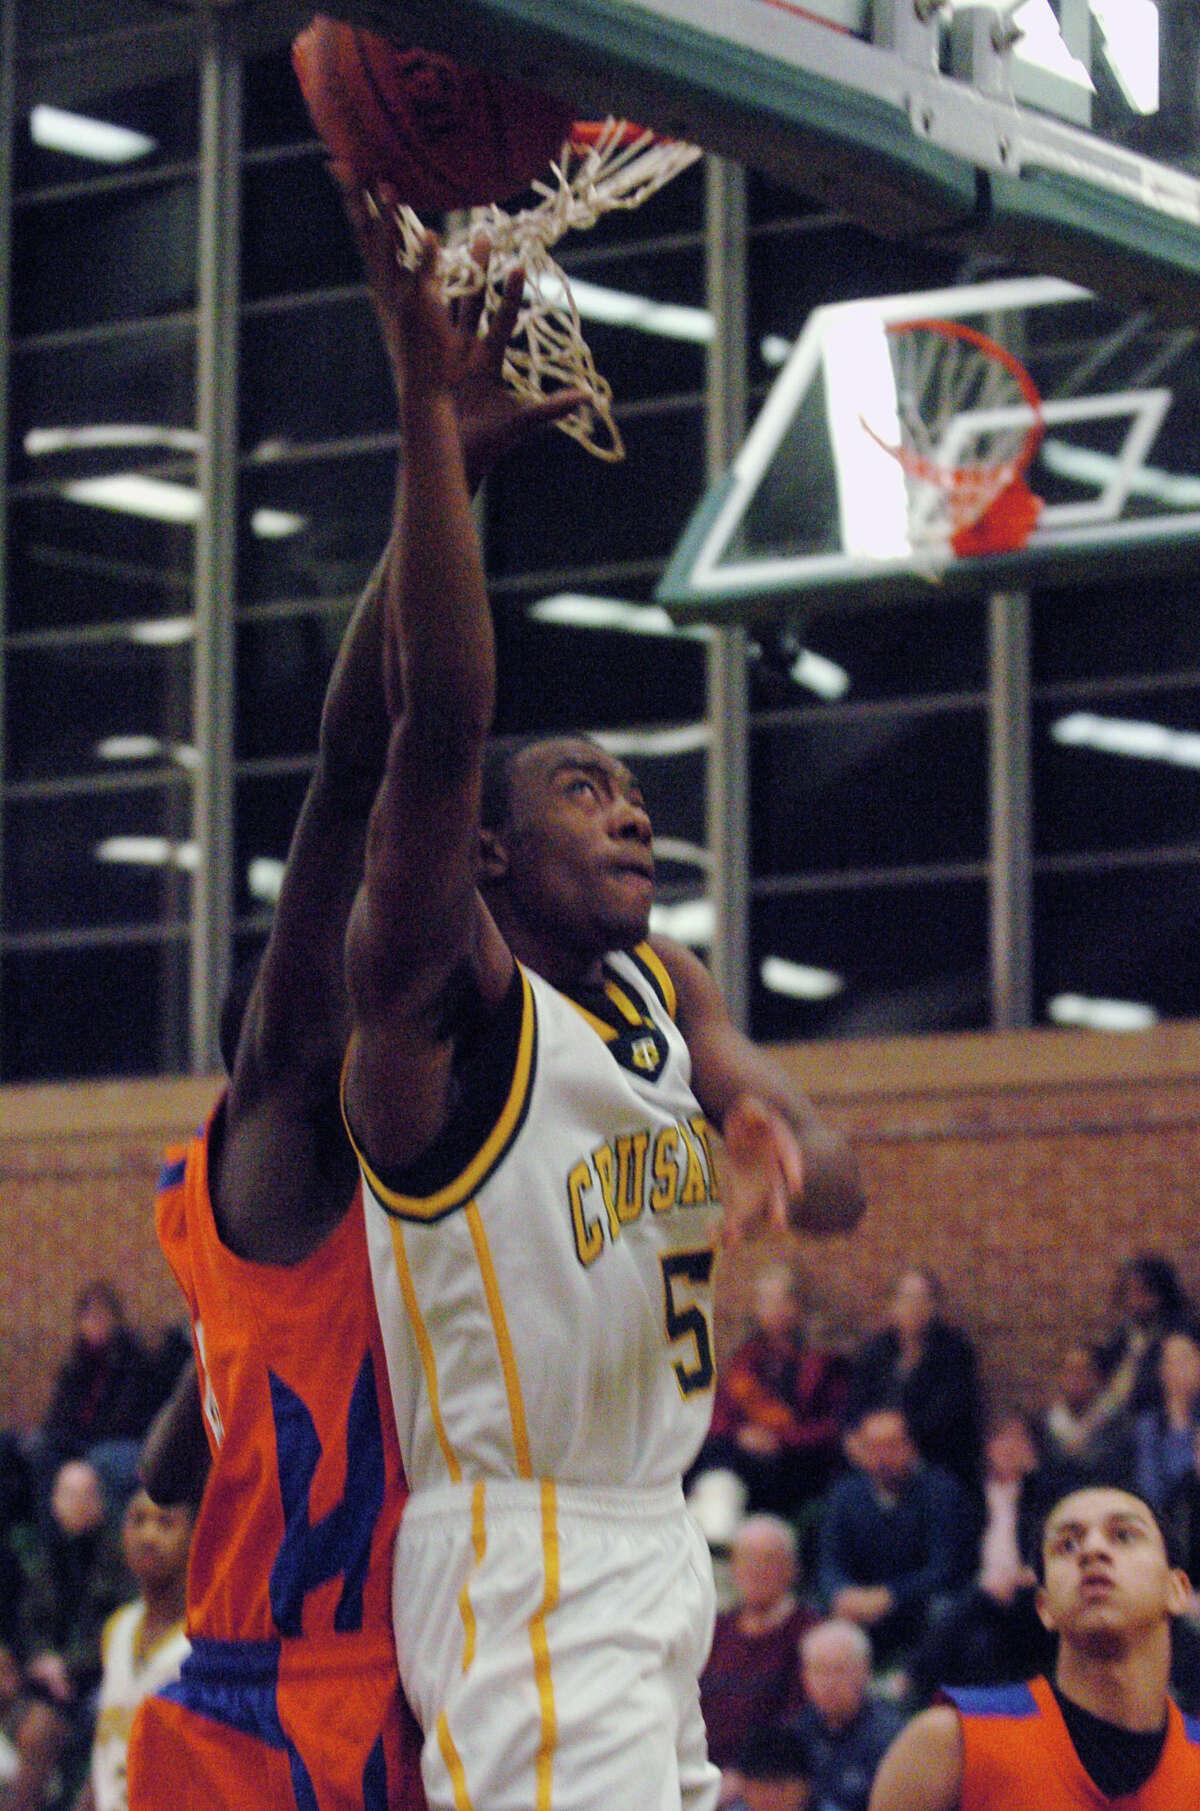 Trinity's Brandon Wheeler puts the ball up as Trinity Catholic hosts Danbury High School in a boys basketball game in Stamford, Conn., Jan. 18, 2013.